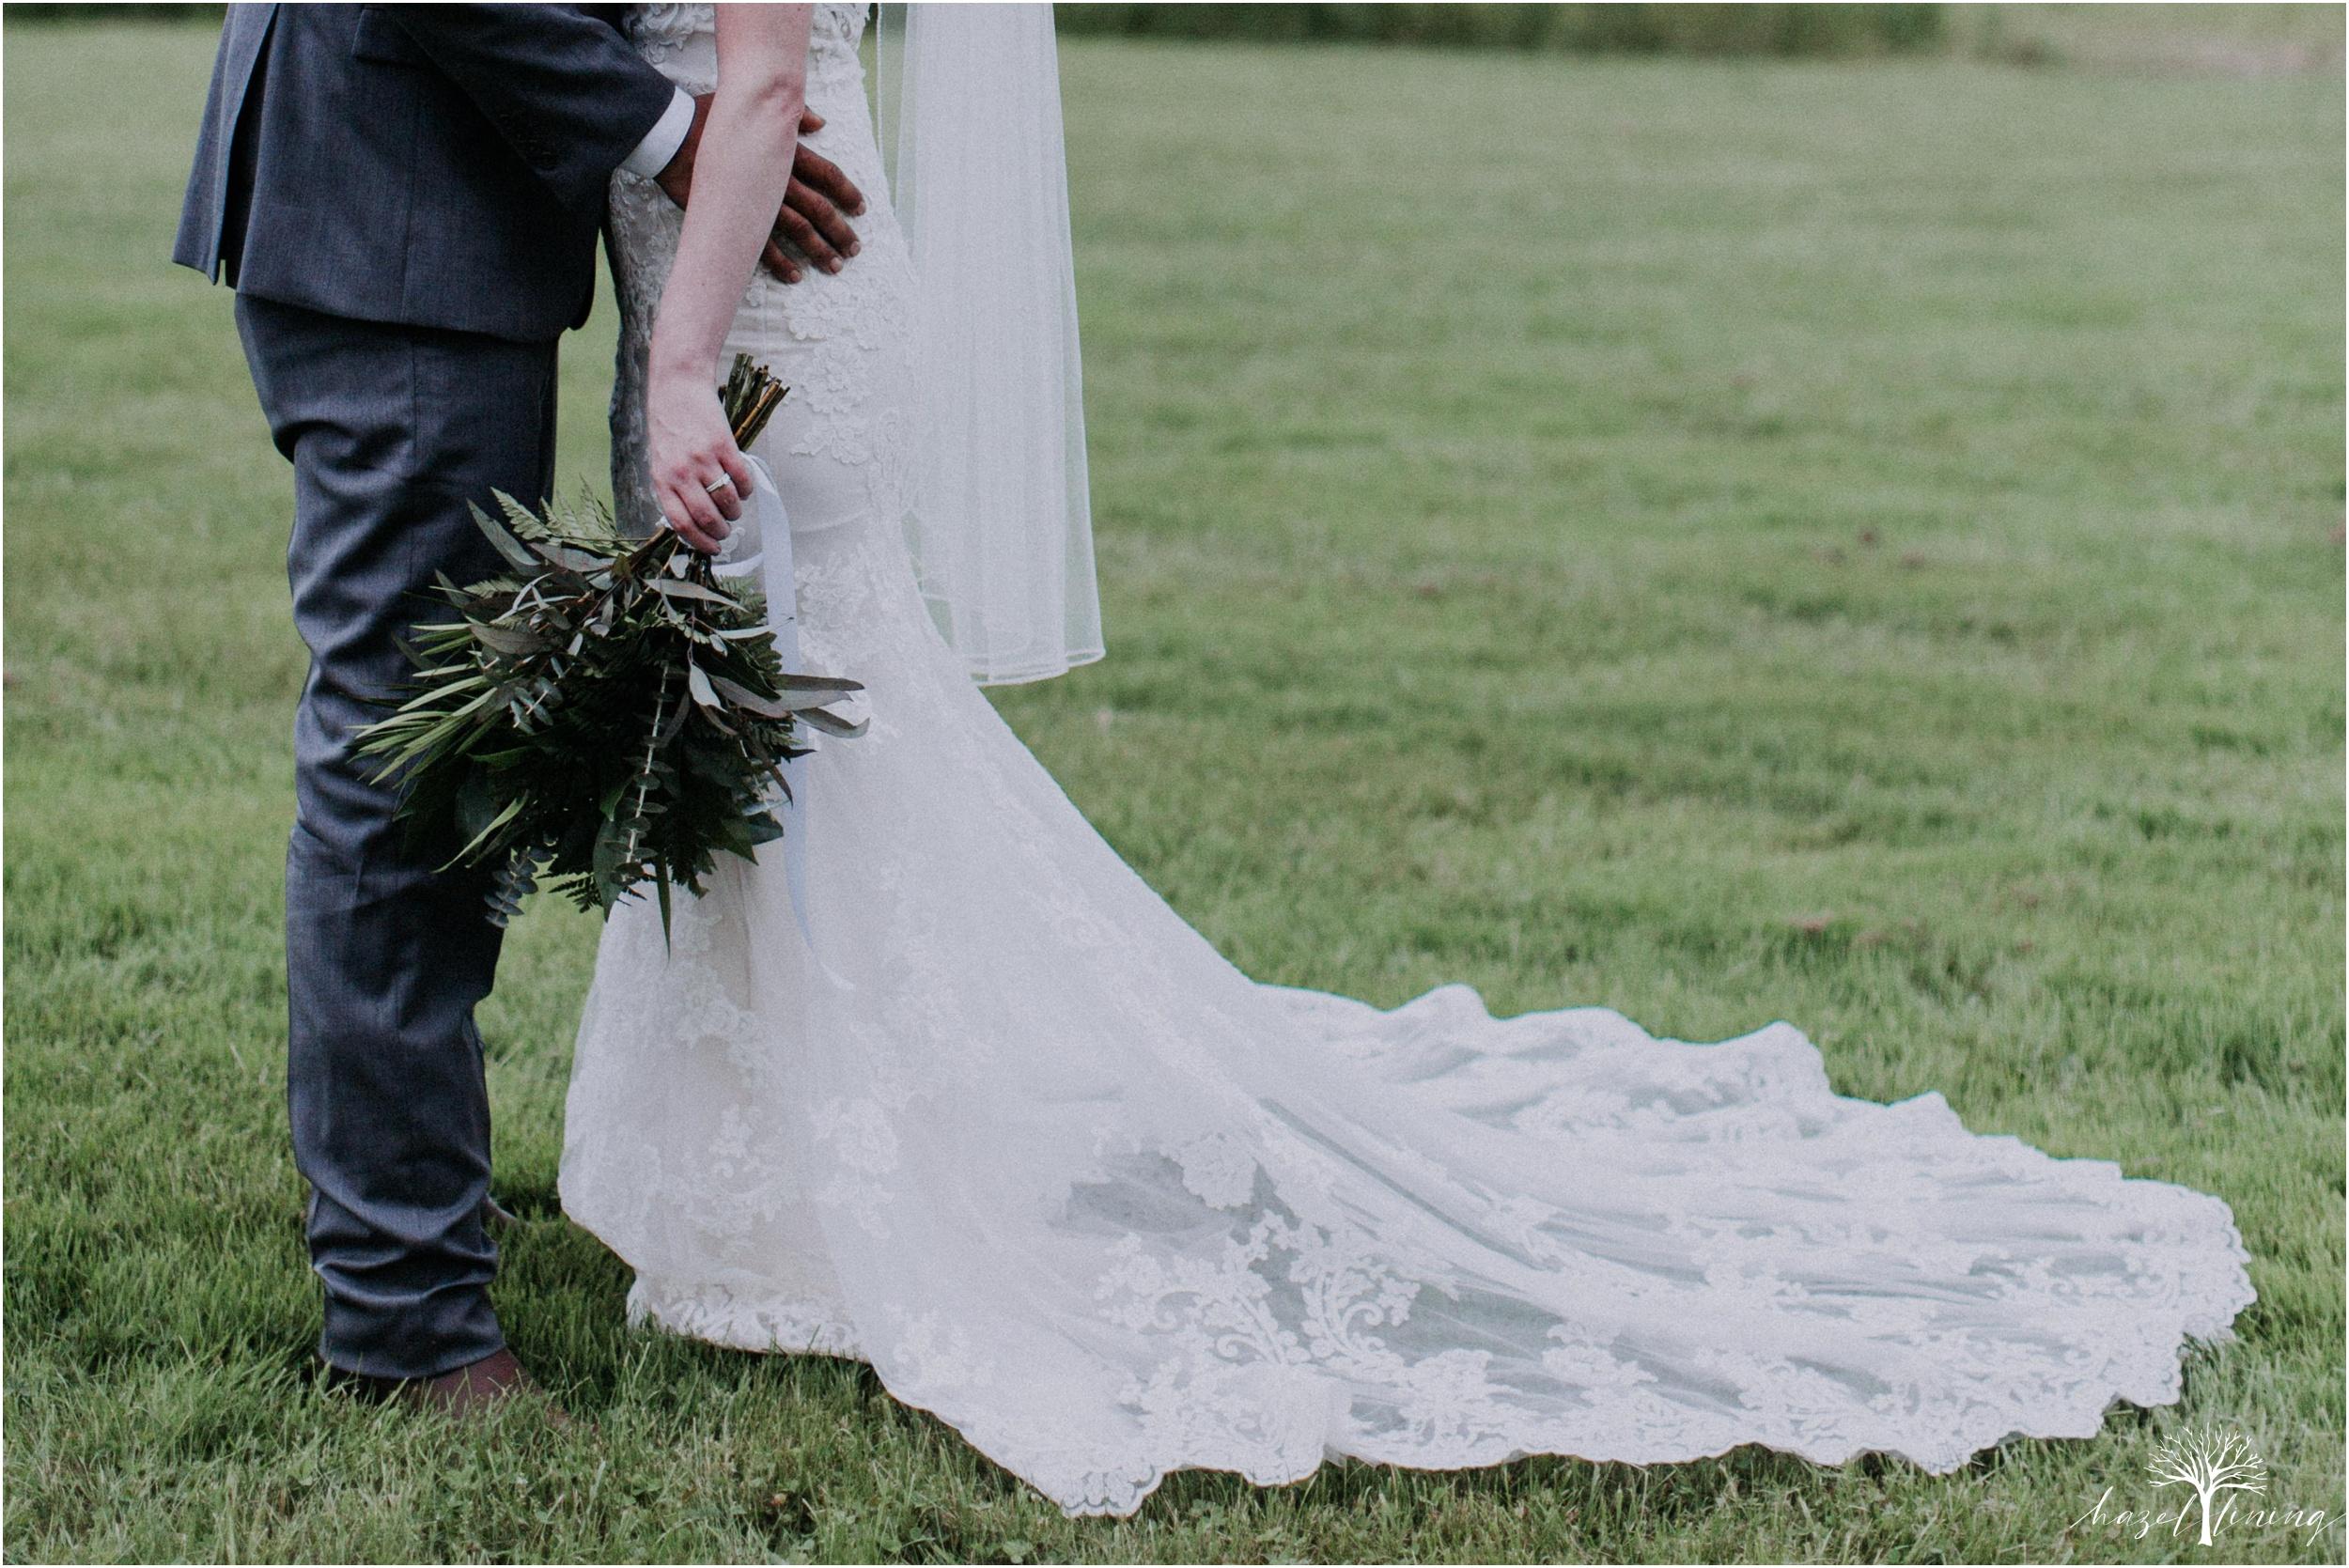 hazel-lining-travel-wedding-elopement-photography-lisa-landon-shoemaker-the-farm-bakery-and-events-bucks-county-quakertown-pennsylvania-summer-country-outdoor-farm-wedding_0085.jpg